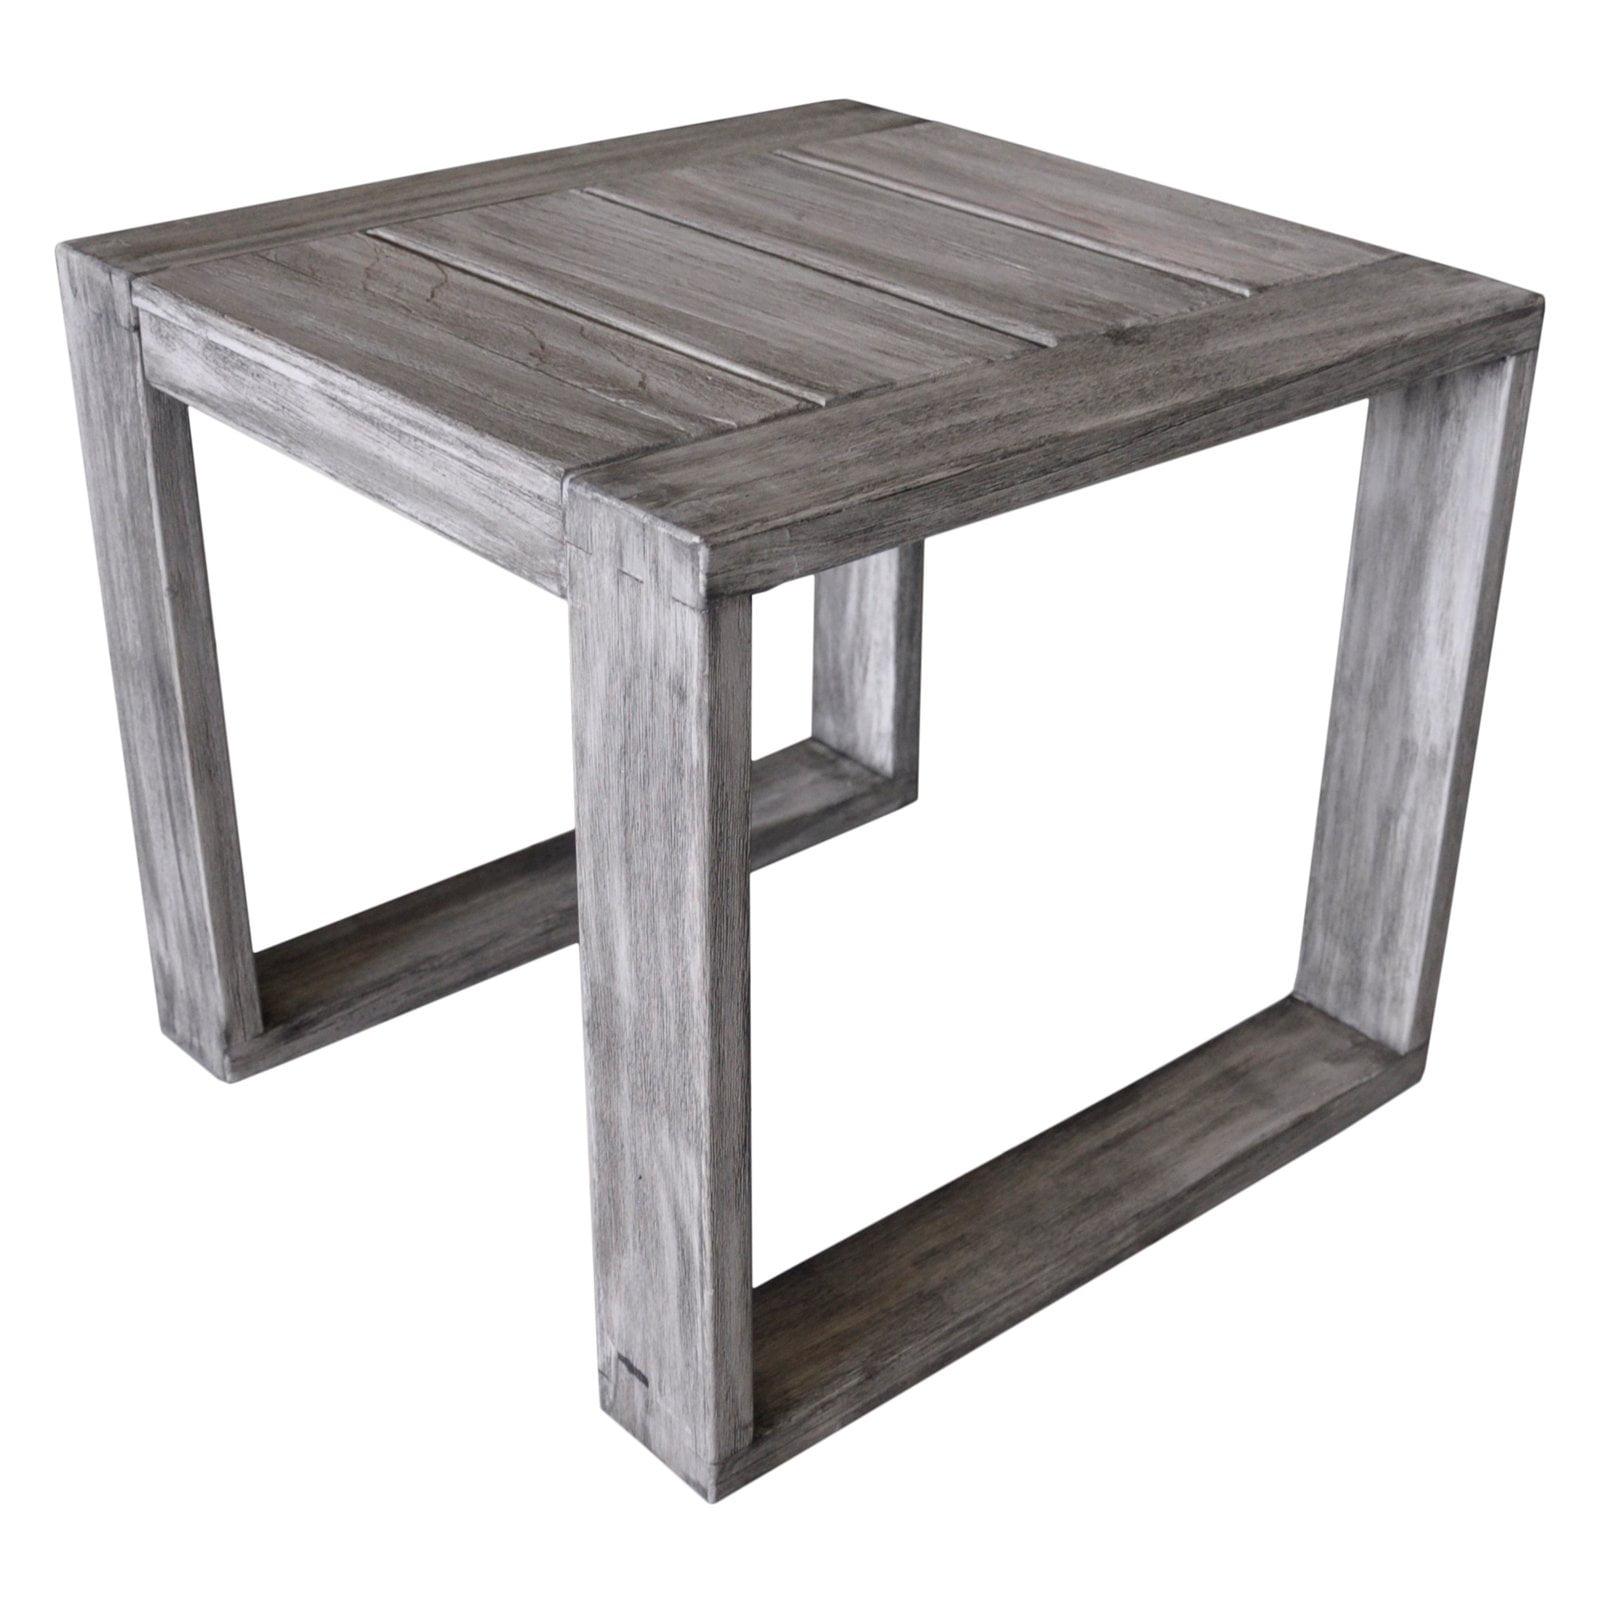 Driftwood Teak Table: Driftwood Gray Teak Modern North Shore Outdoor Side Table